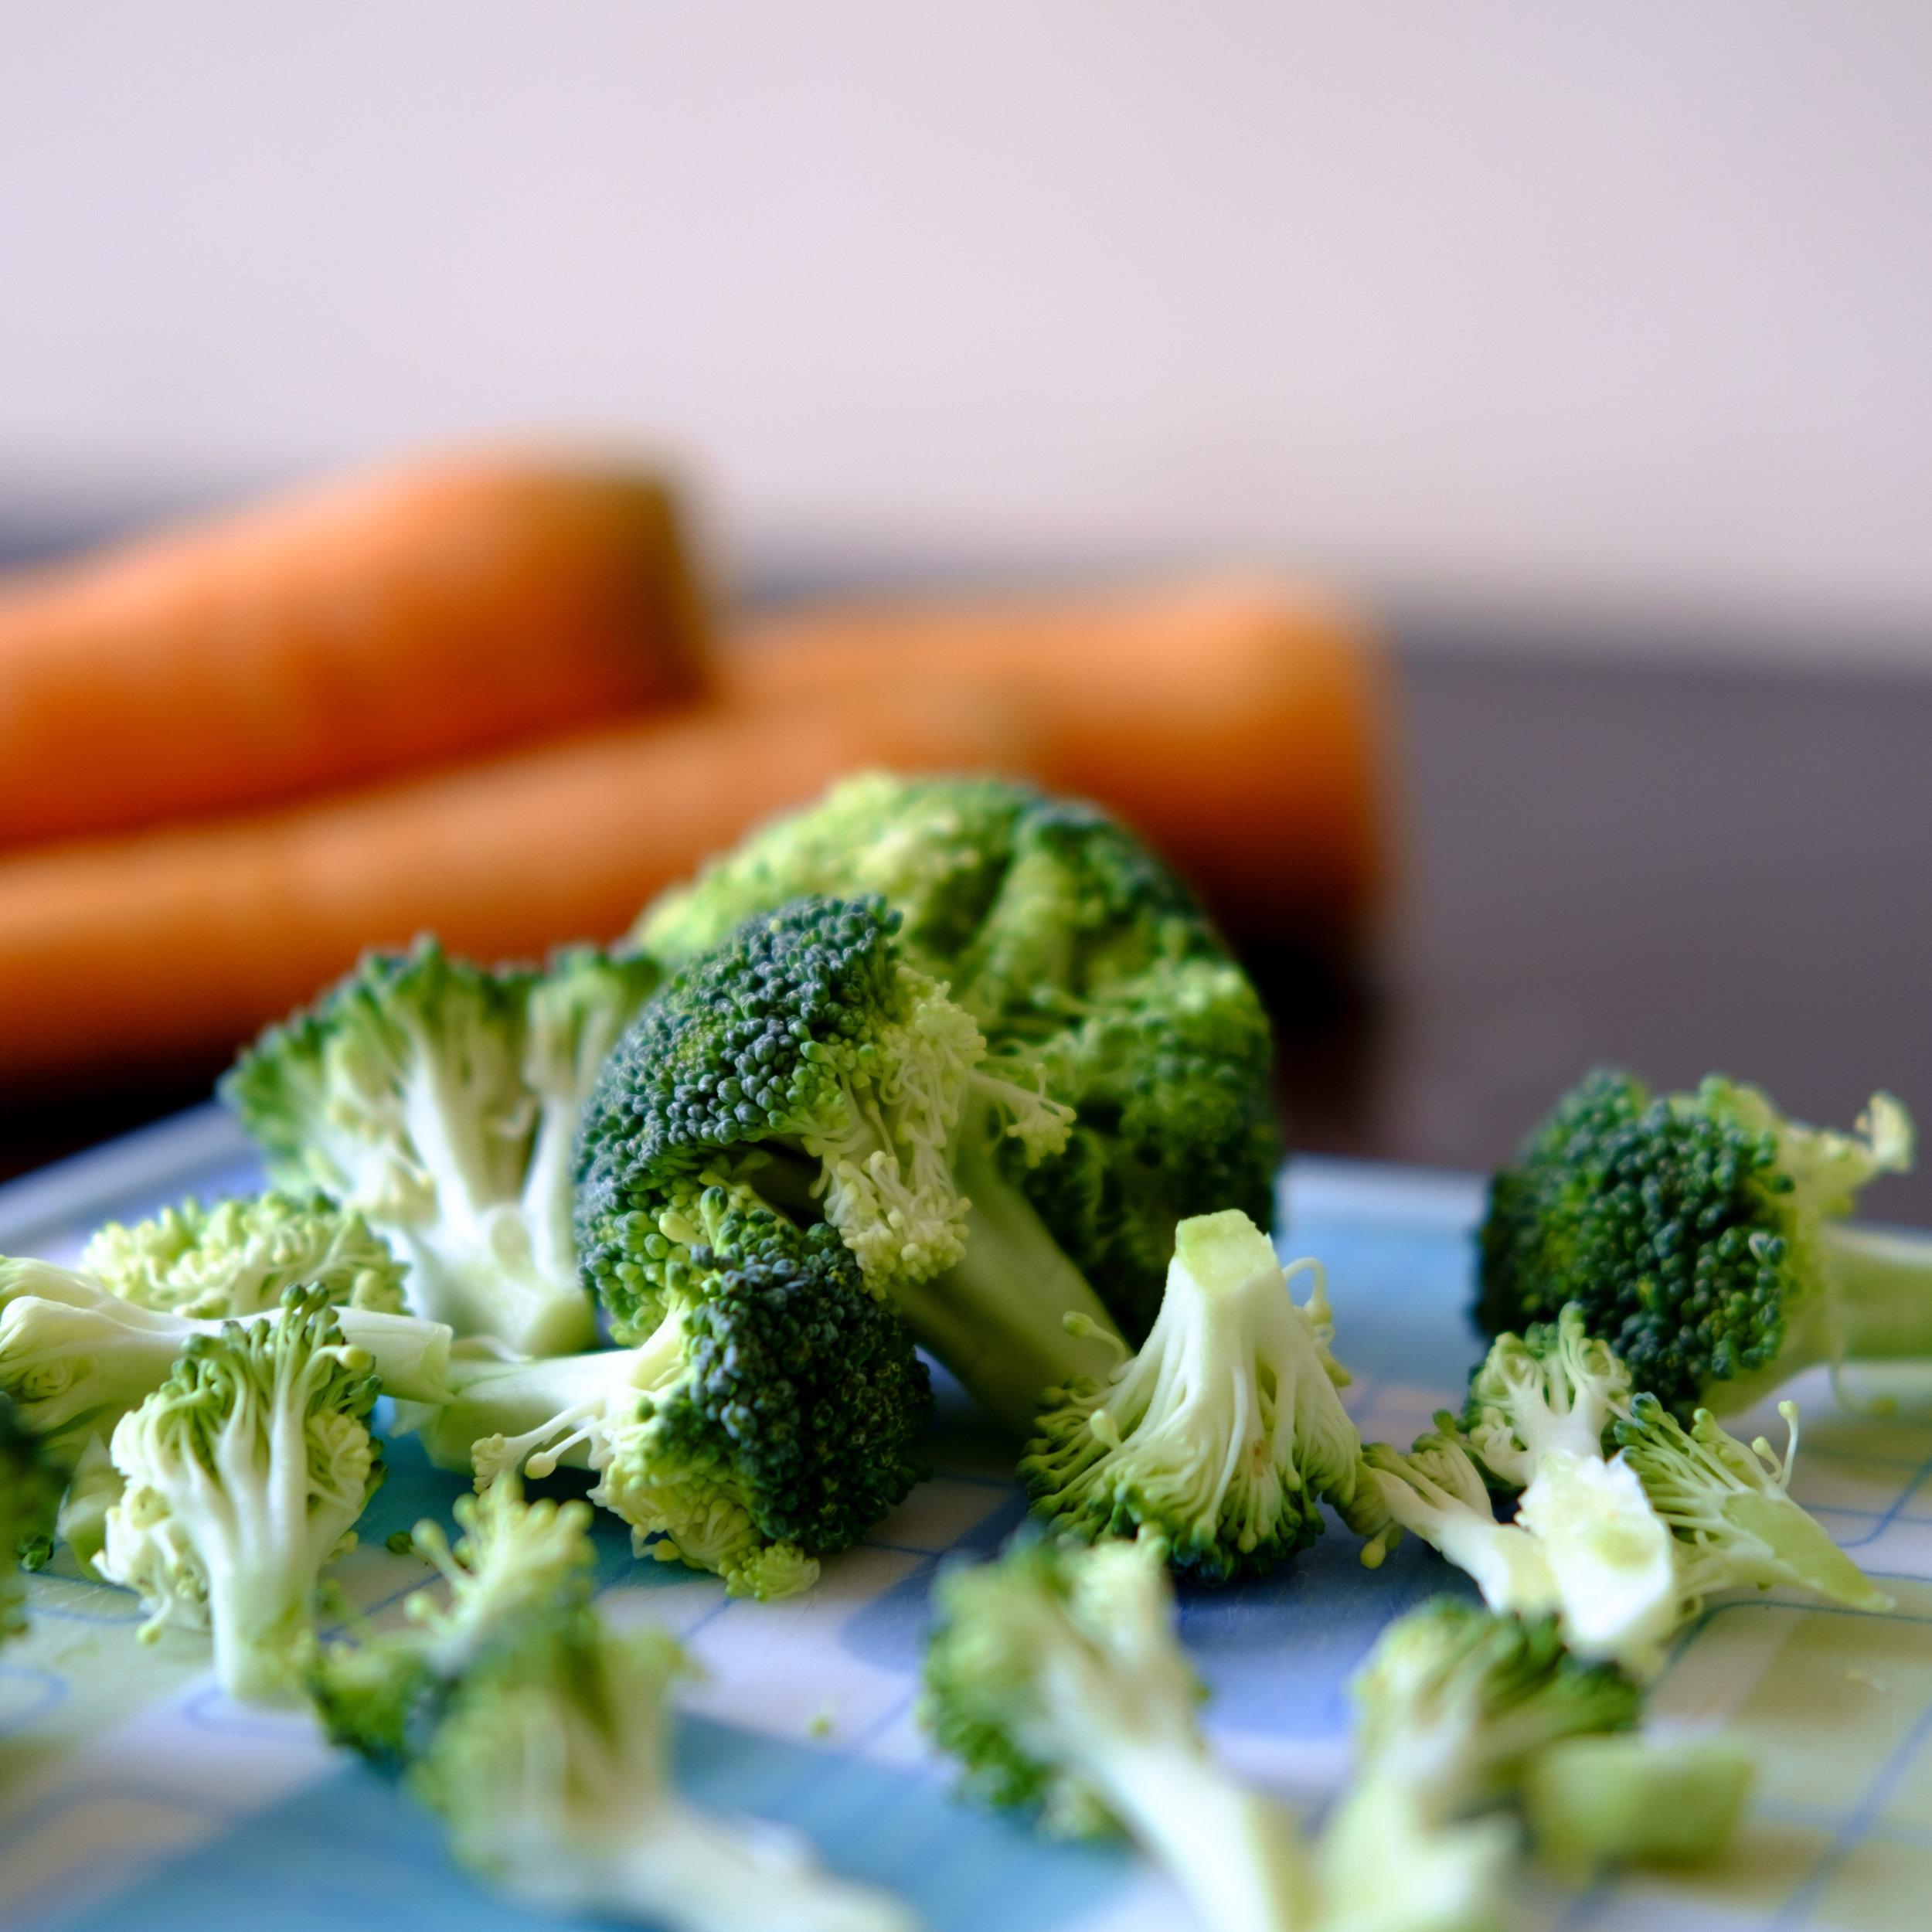 """I actually prefer the steamed broccoli."" said no child ever."